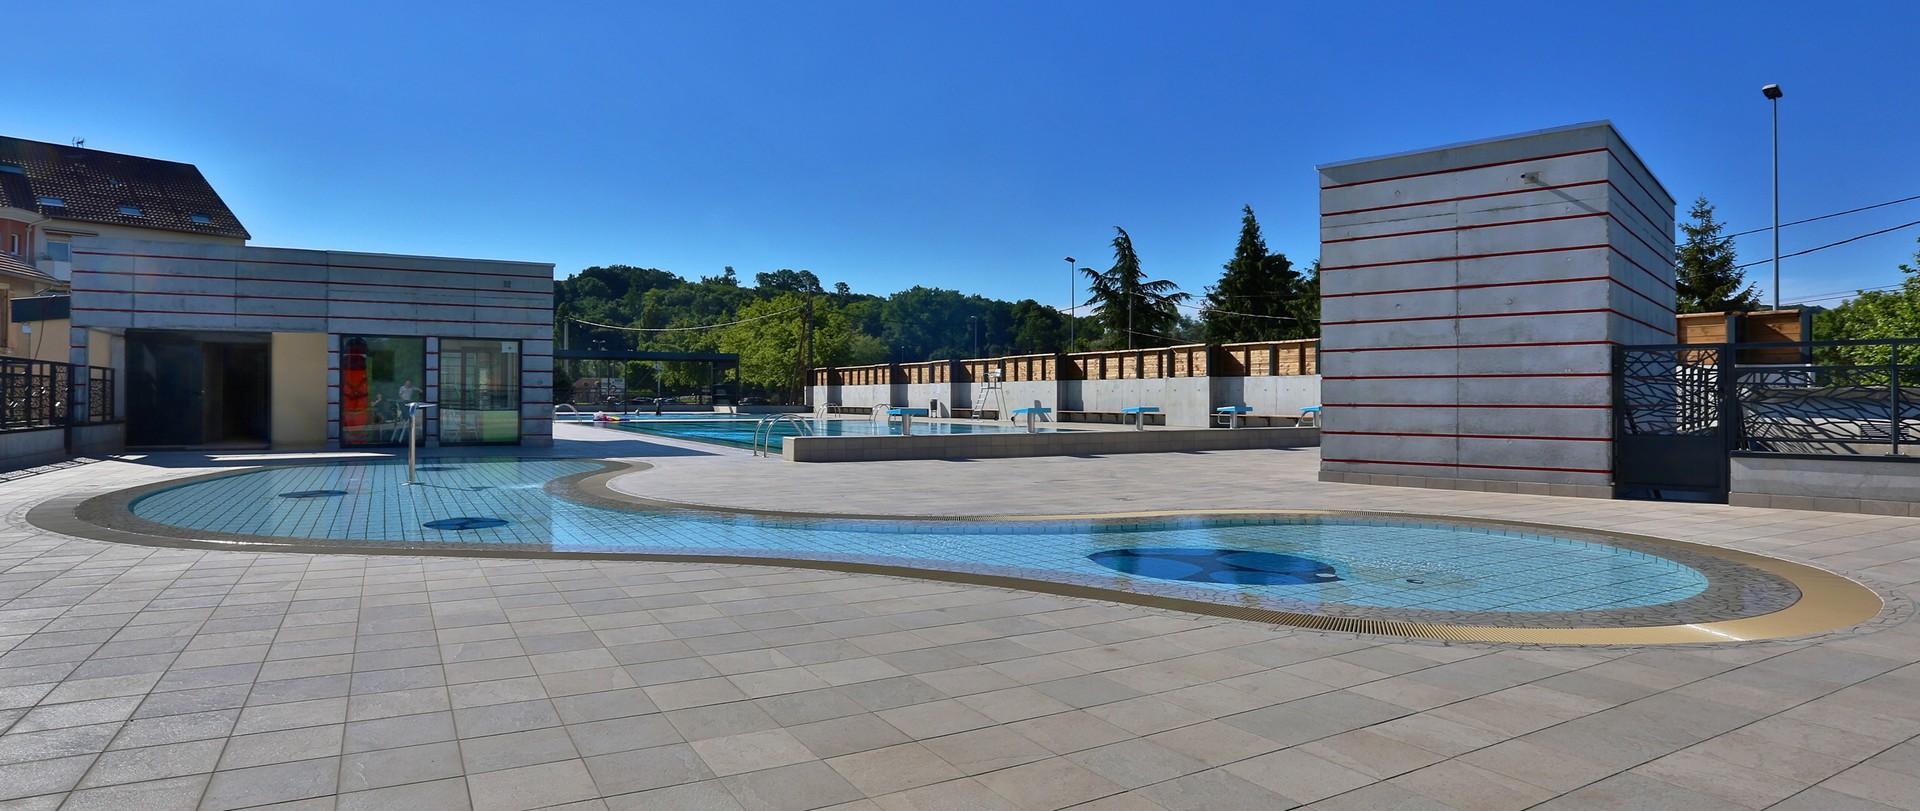 BORTOLI_ARCHITECTURE-REHABILITATION-Piscine-St-Jean-de Bournay-10